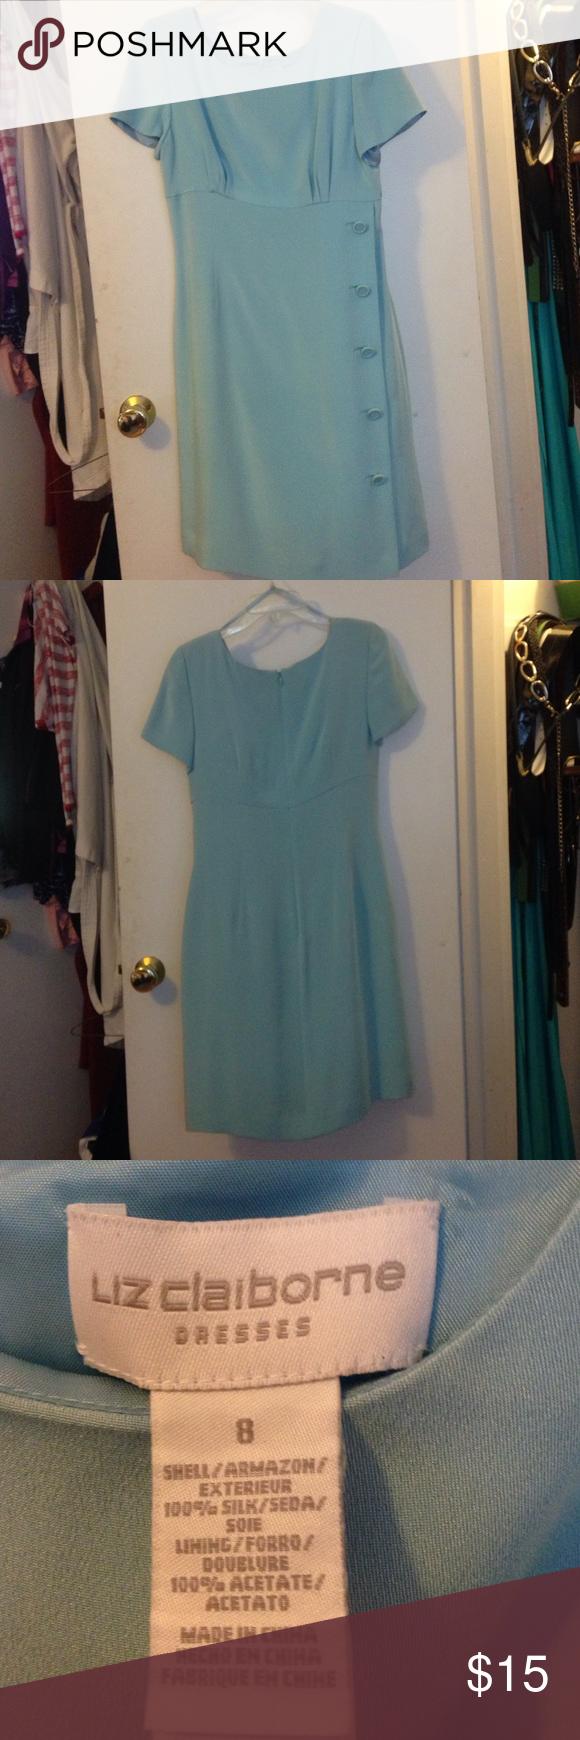 Liz Claiborne pale blue dress New dress never been worn.  No tags. Dresses Midi